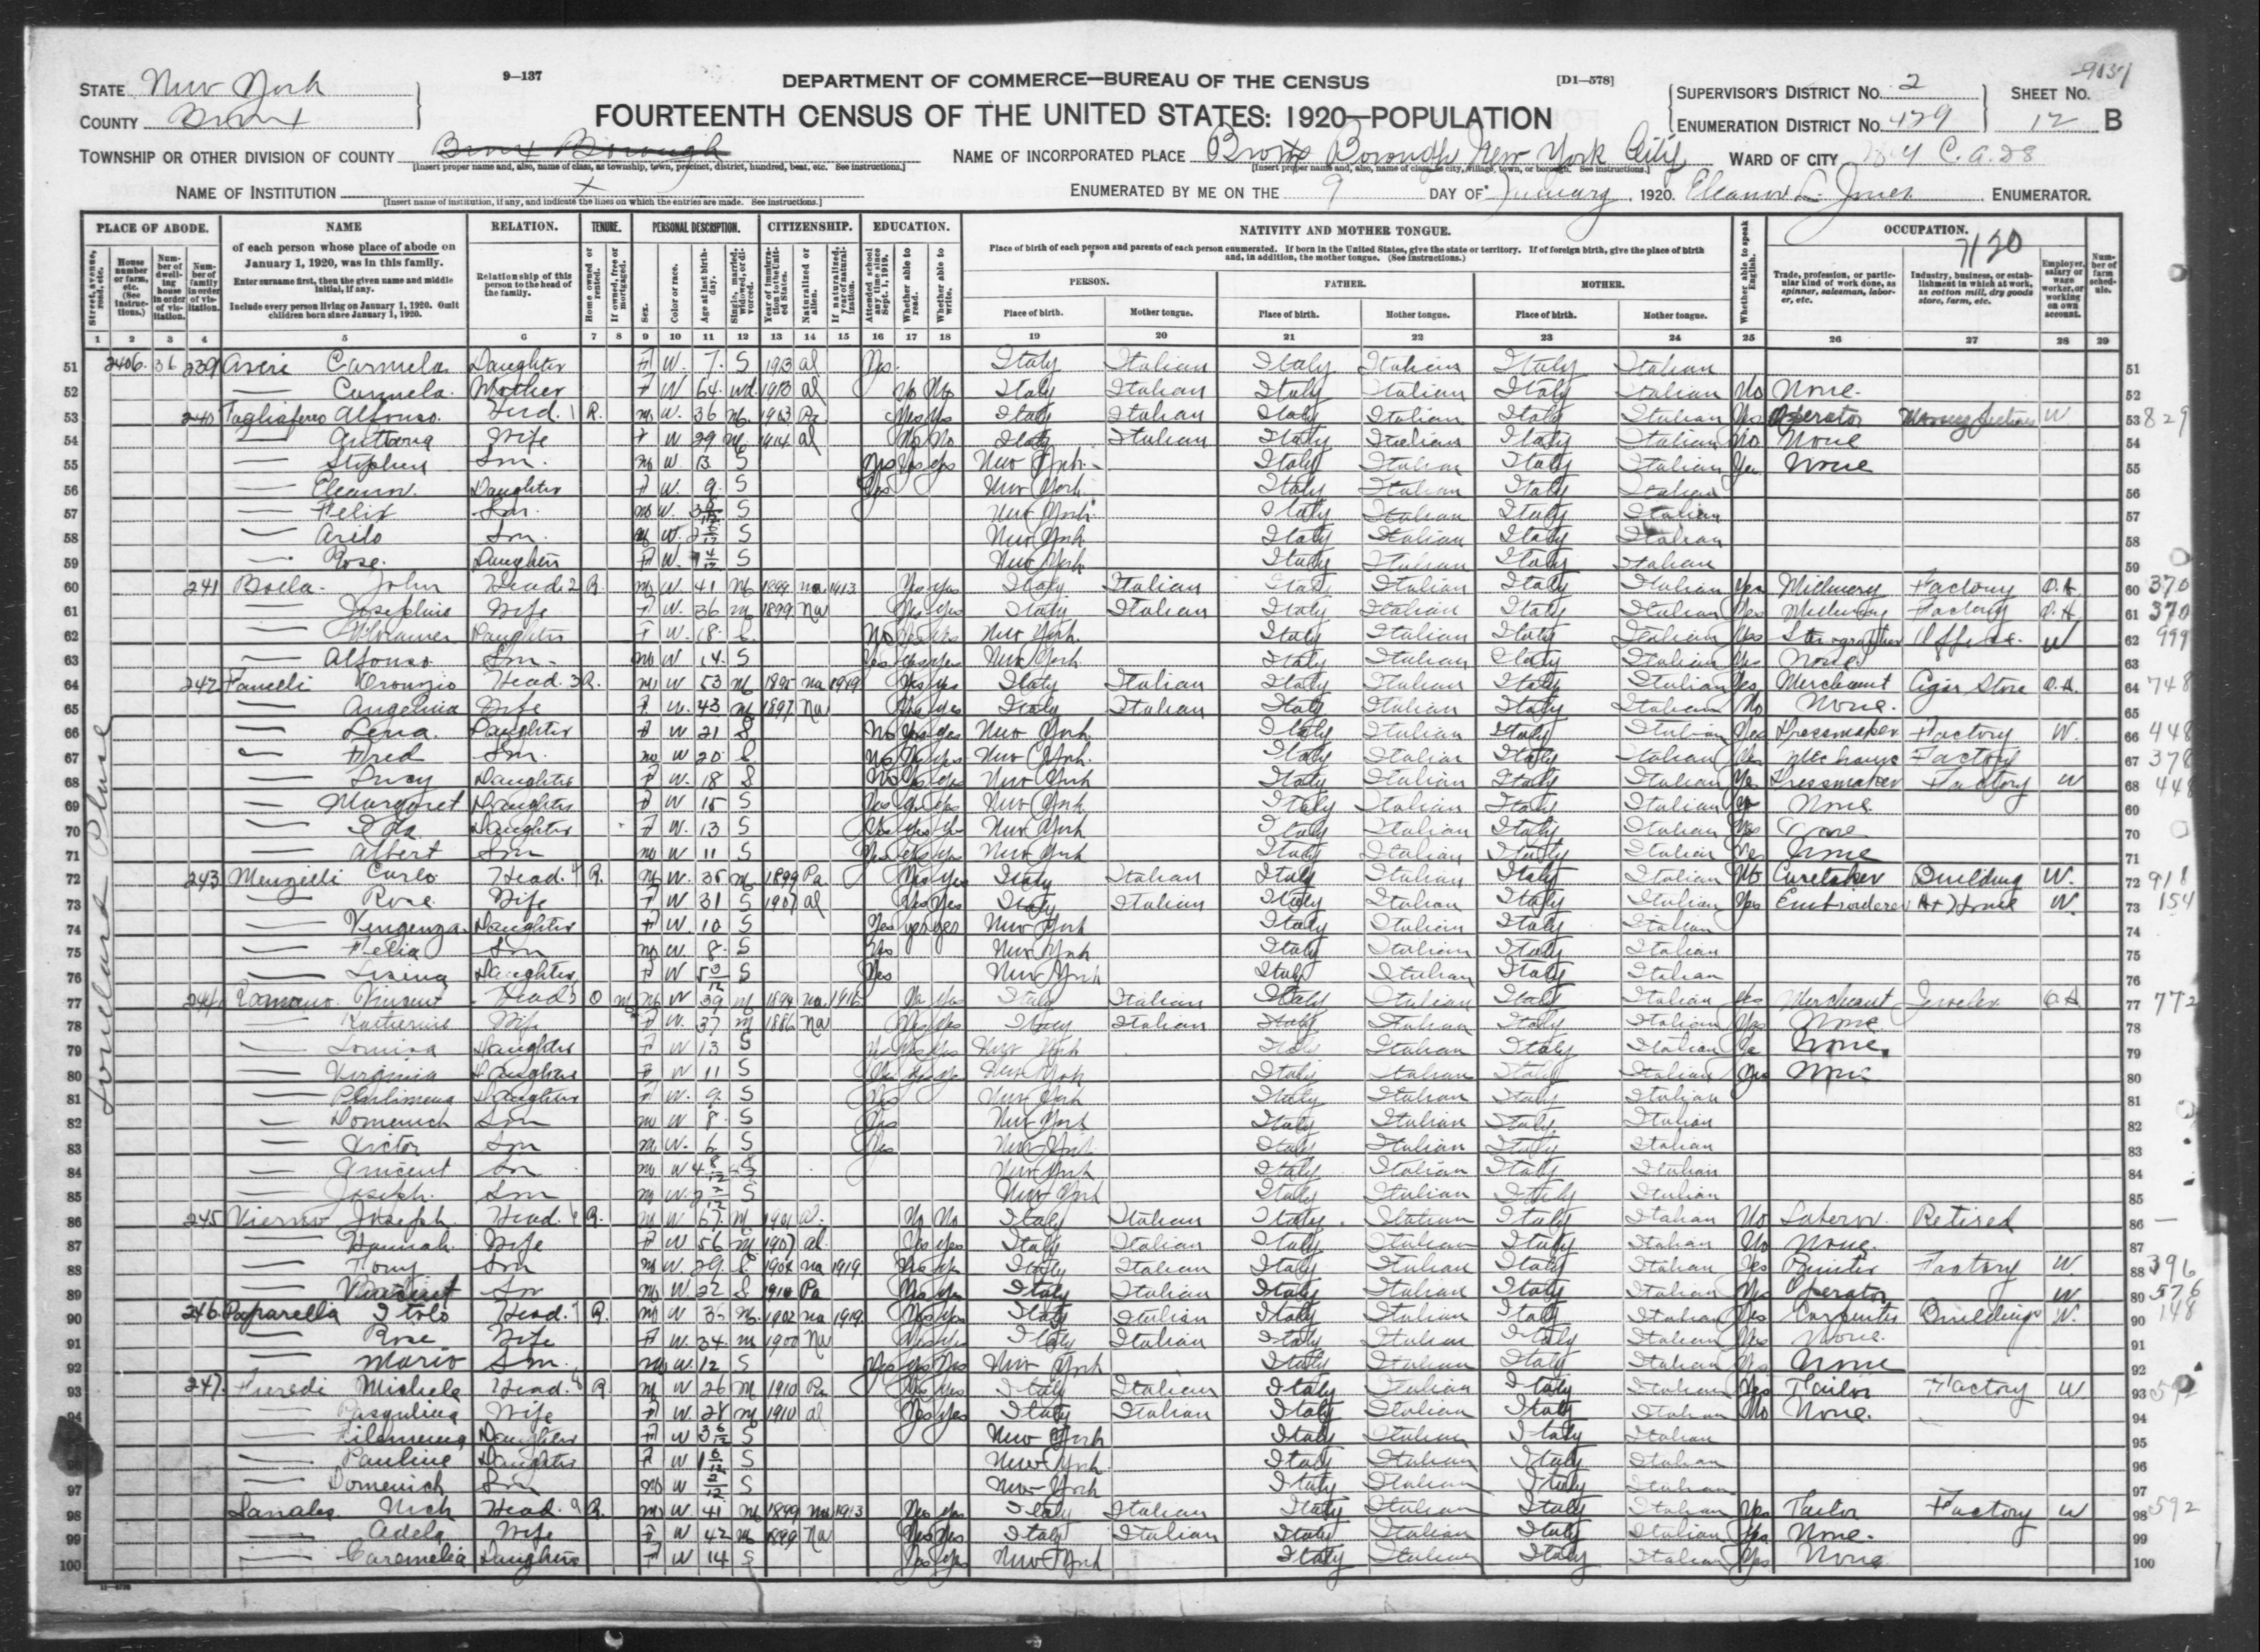 New York: BRONX County, Enumeration District 429, Sheet No. 12B